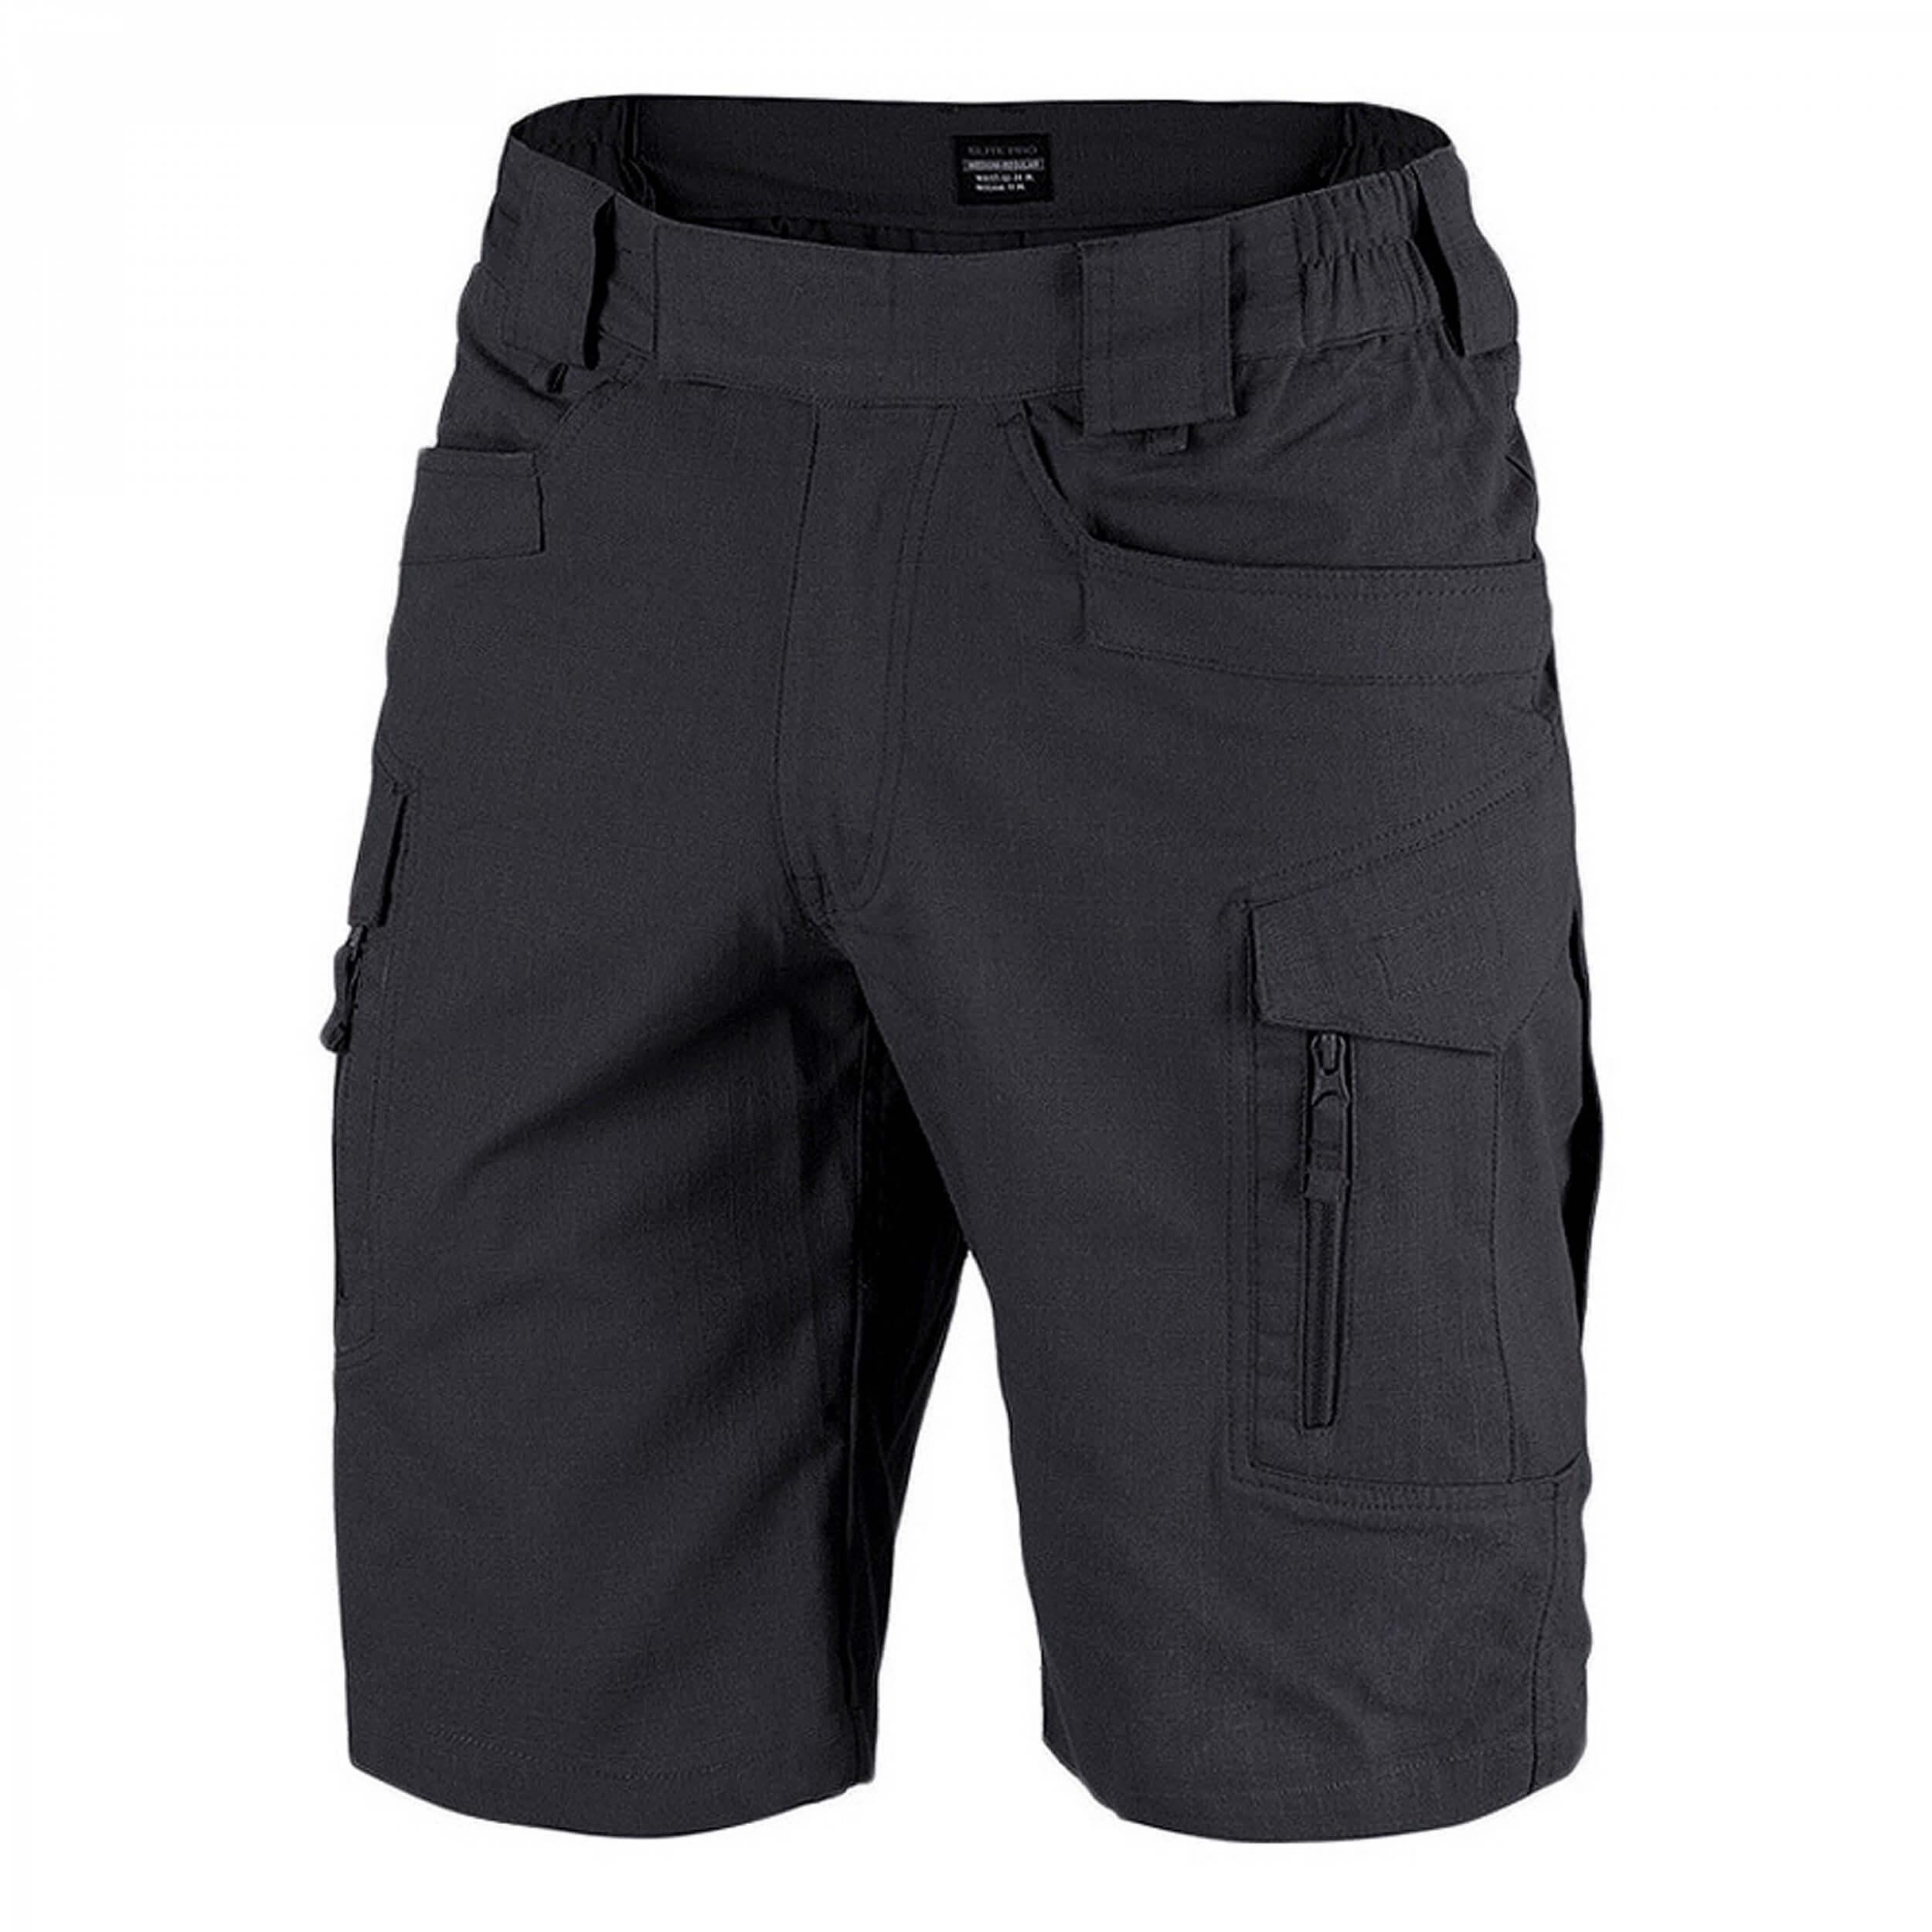 Texar Elite Pro shorts rip-stop black